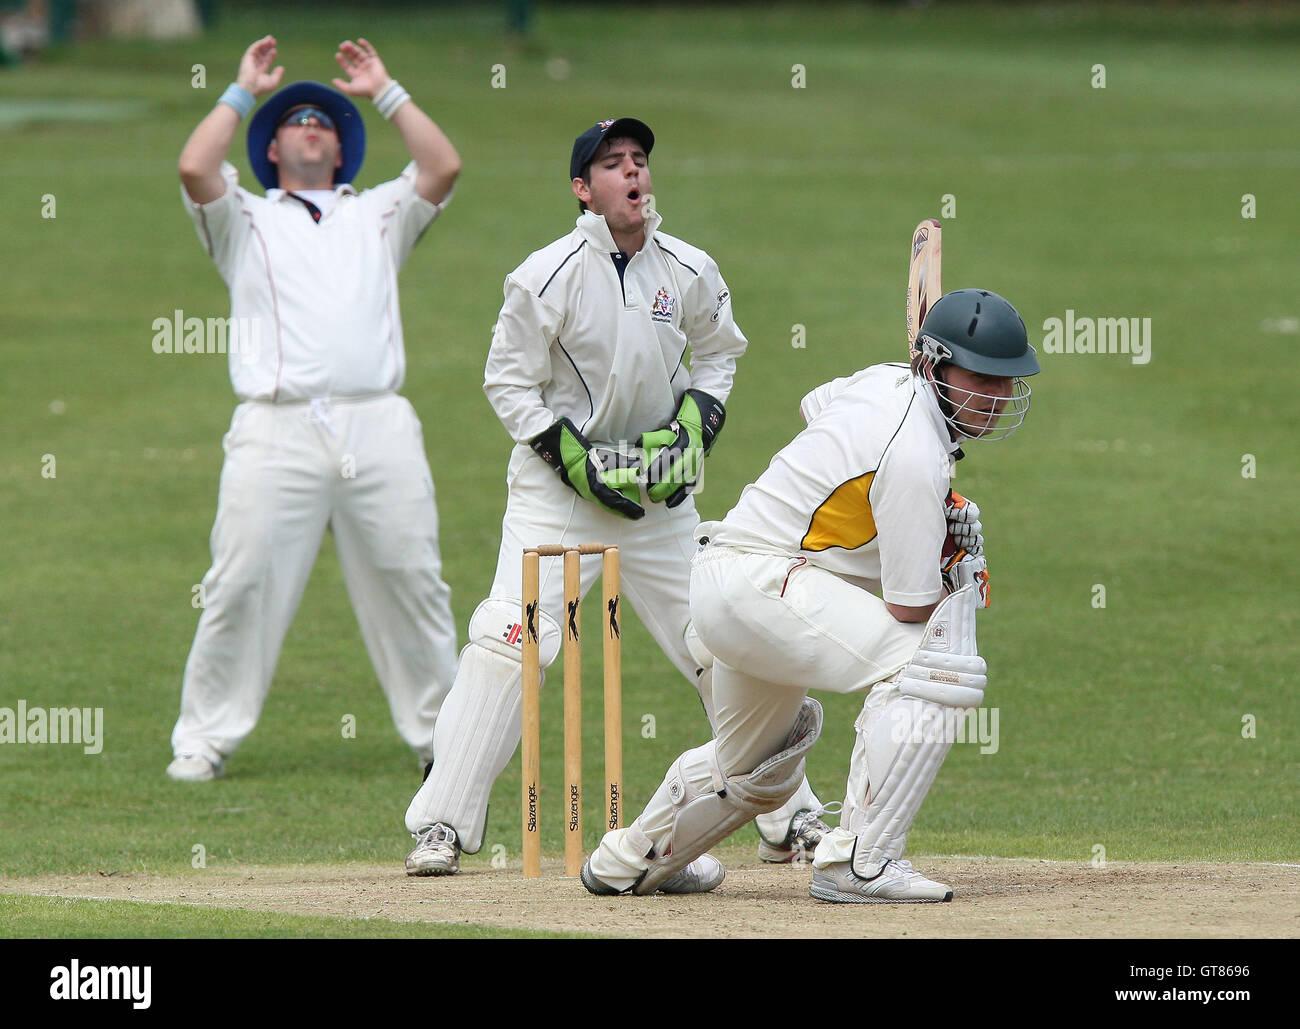 Essex Cricket Batsman Stock Photos Amp Essex Cricket Batsman